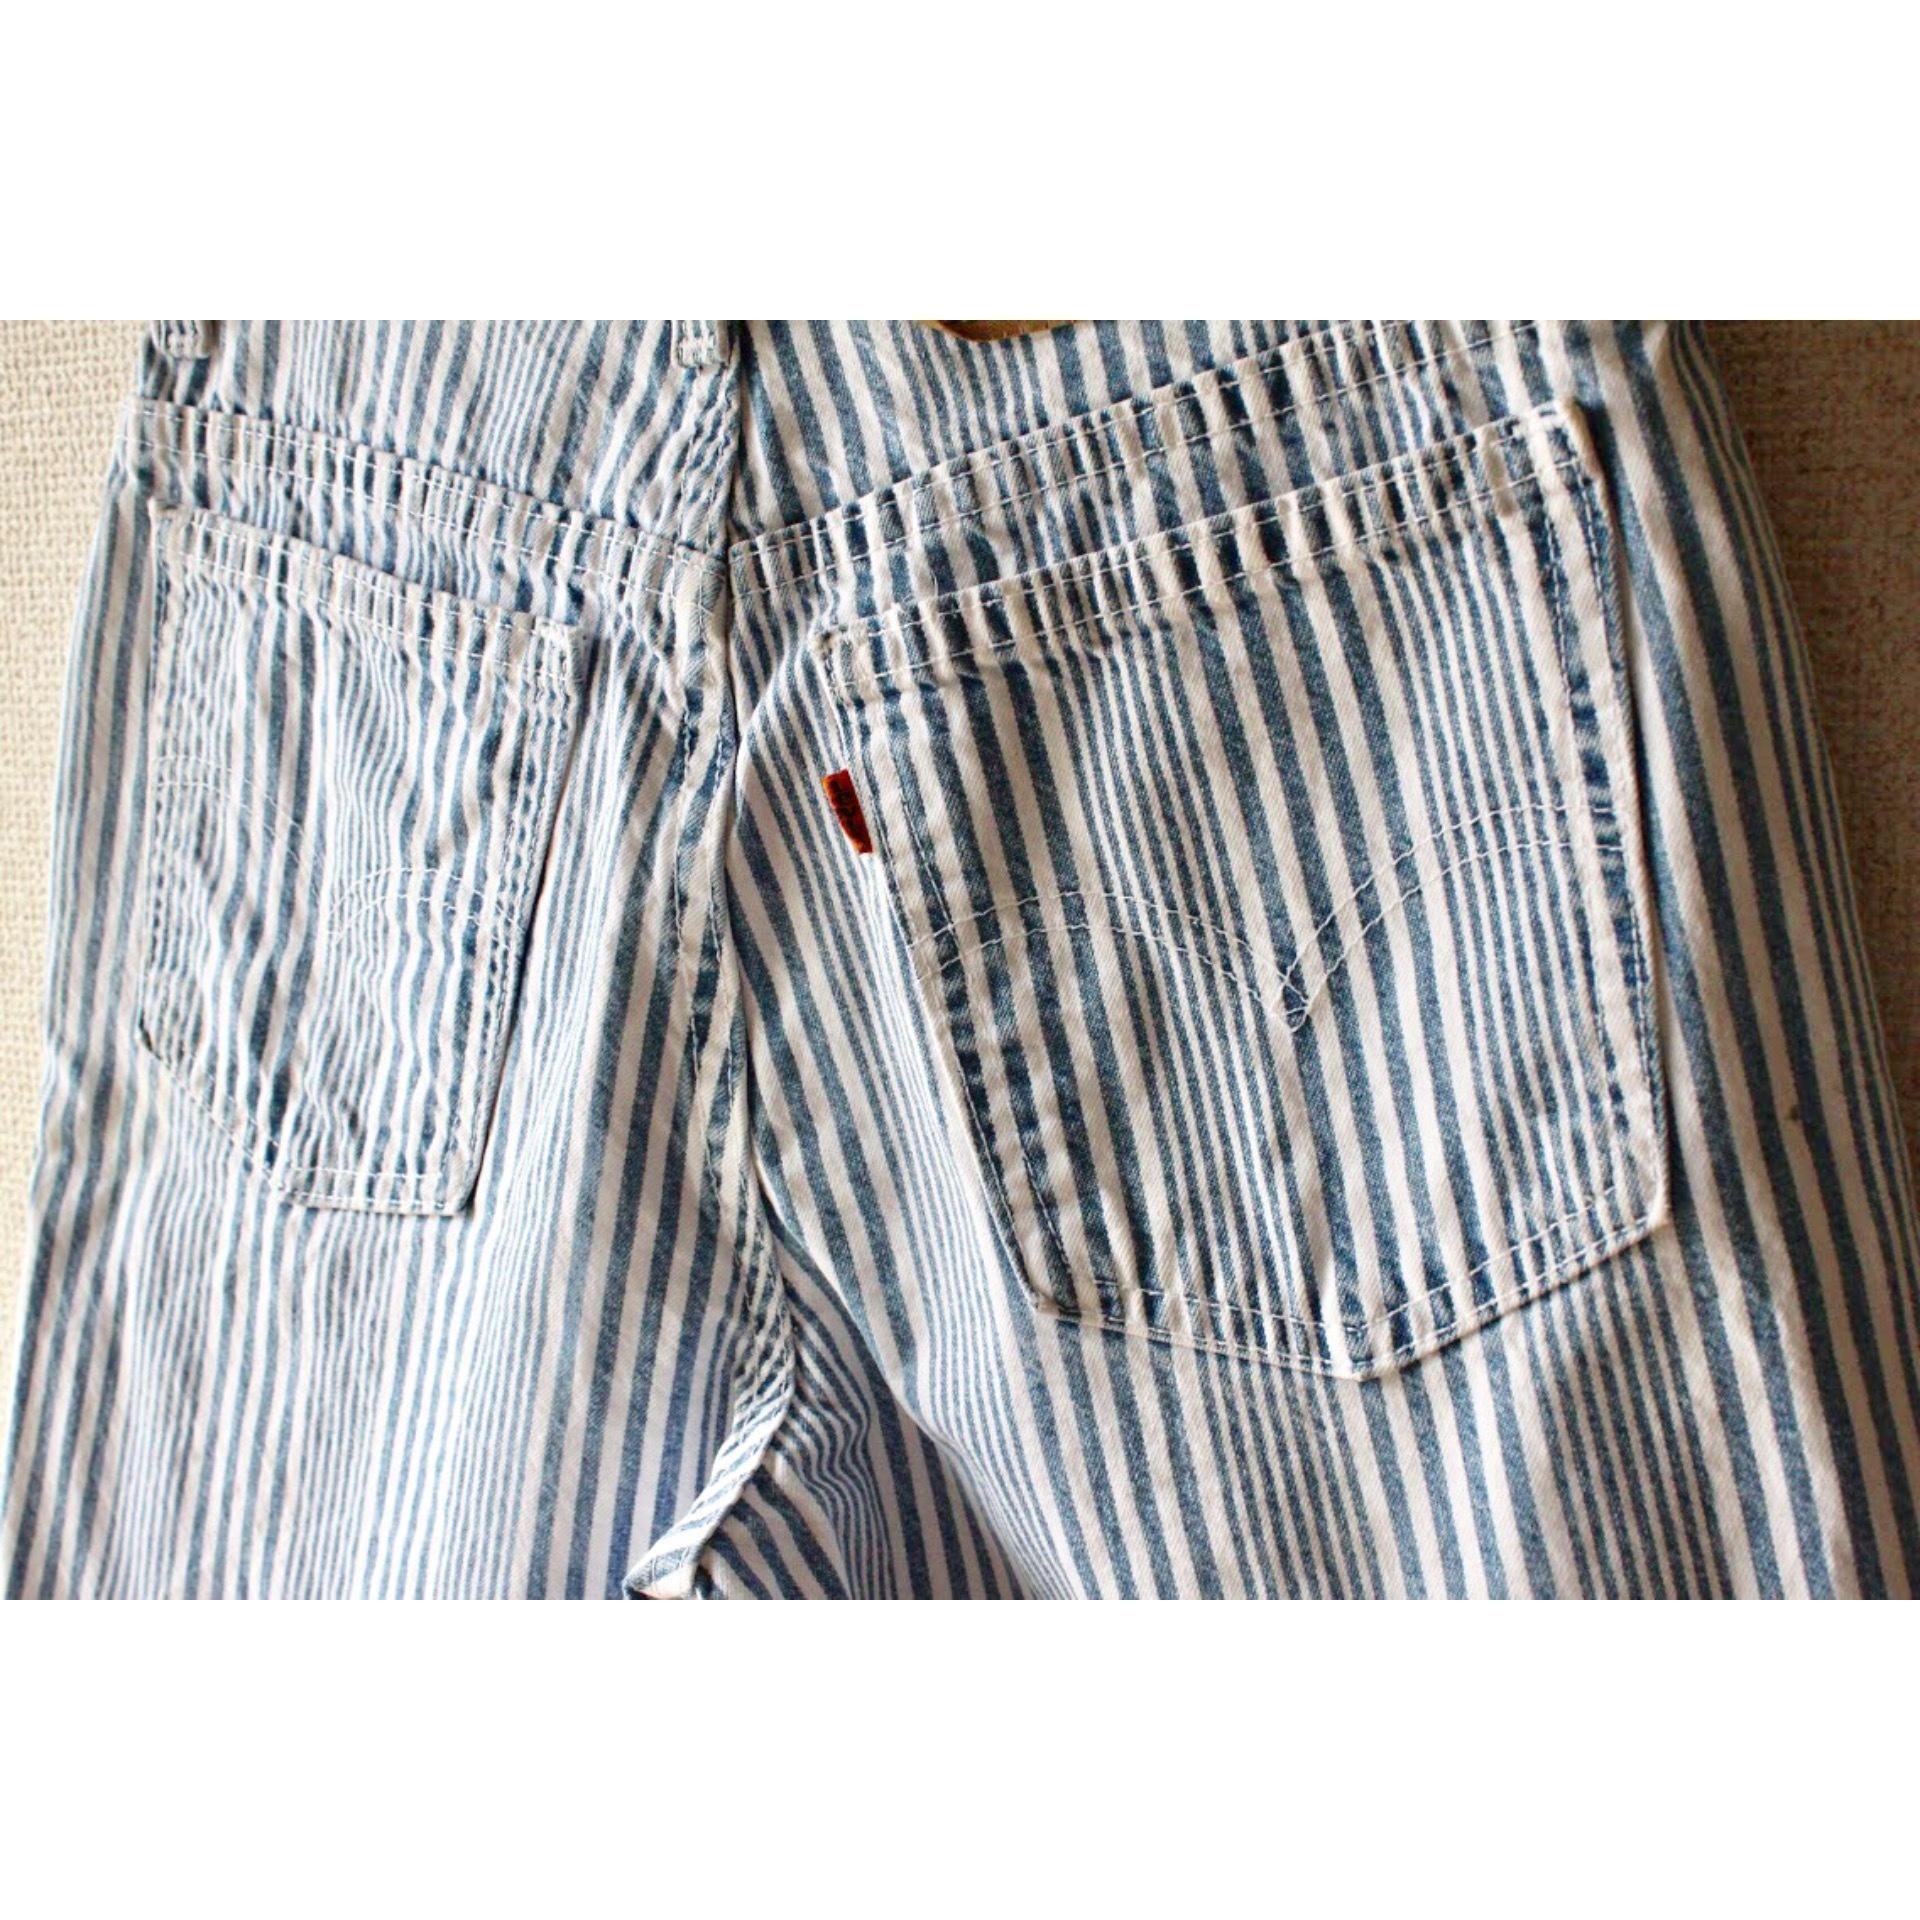 Vintage stripe denim shorts by Levis